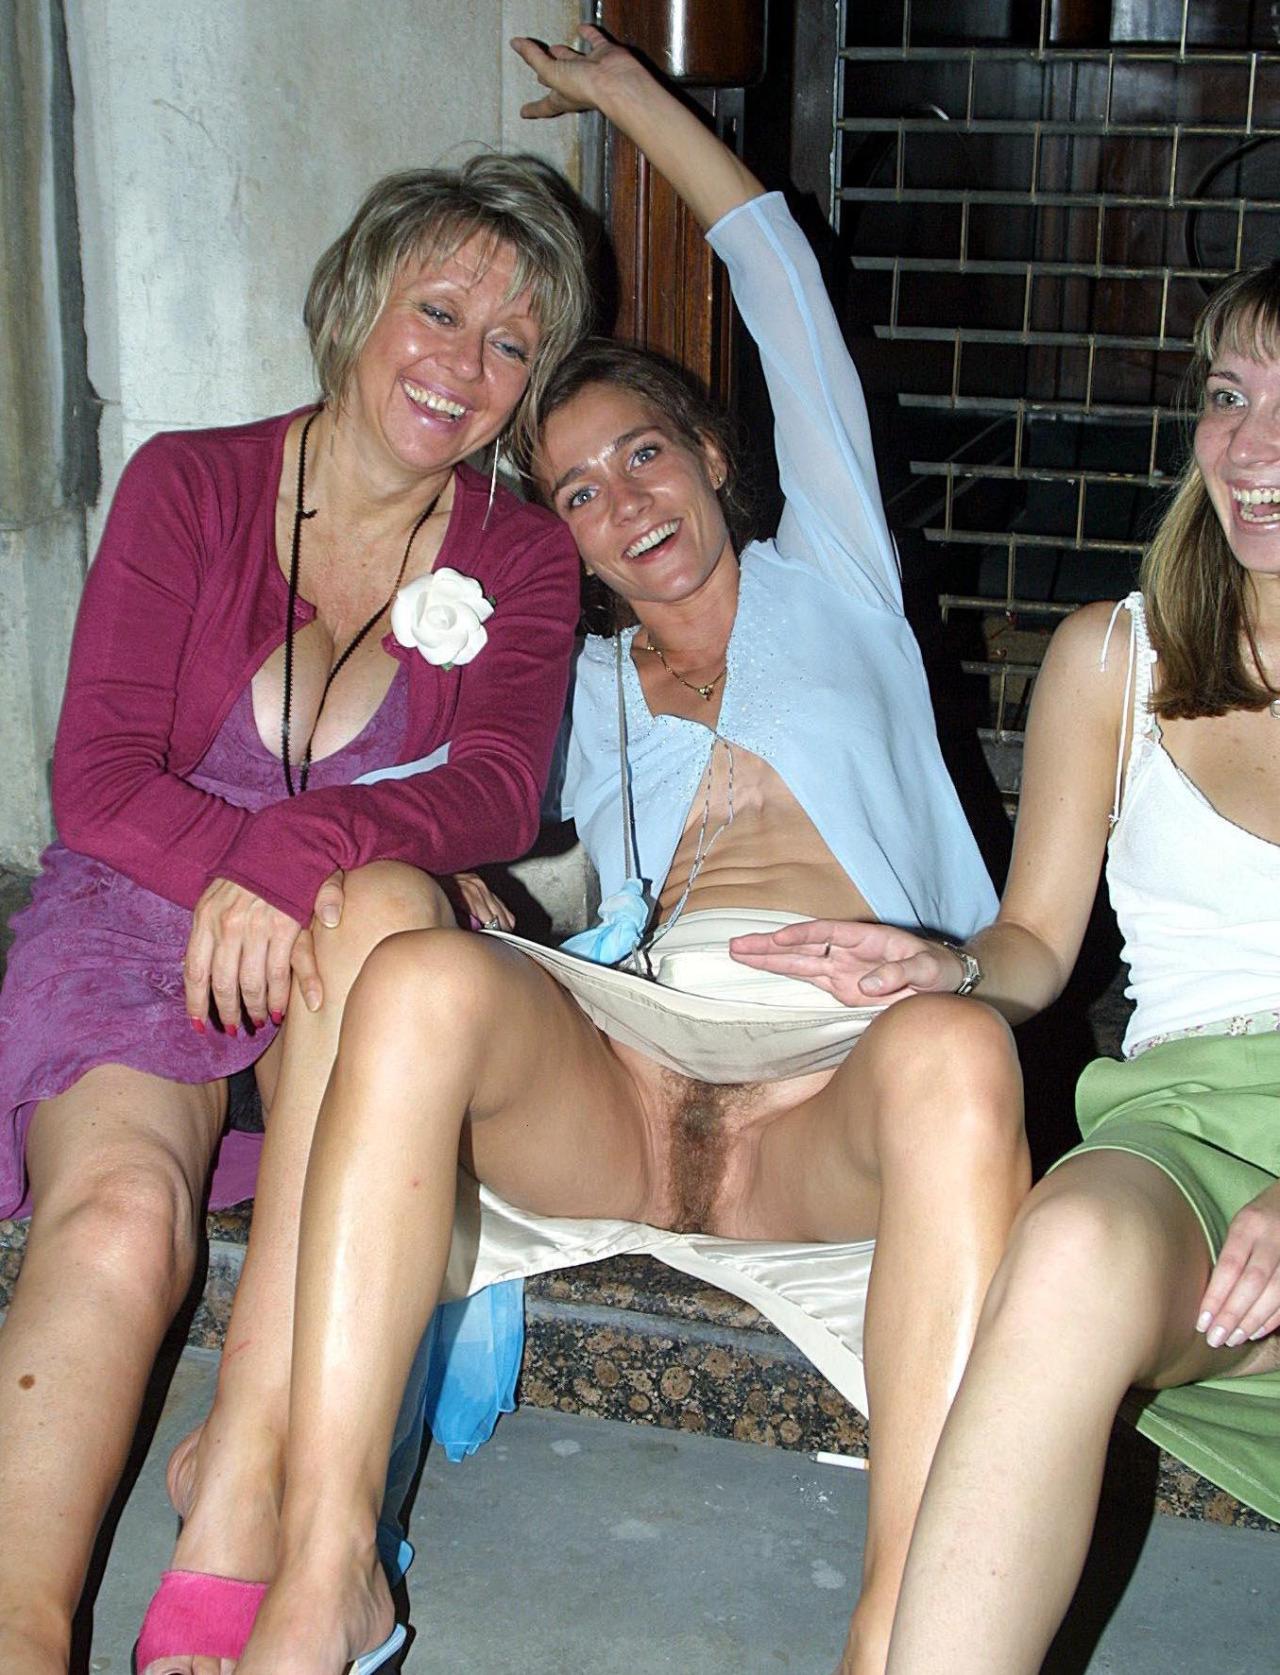 Girls caught flashing their knickers 12